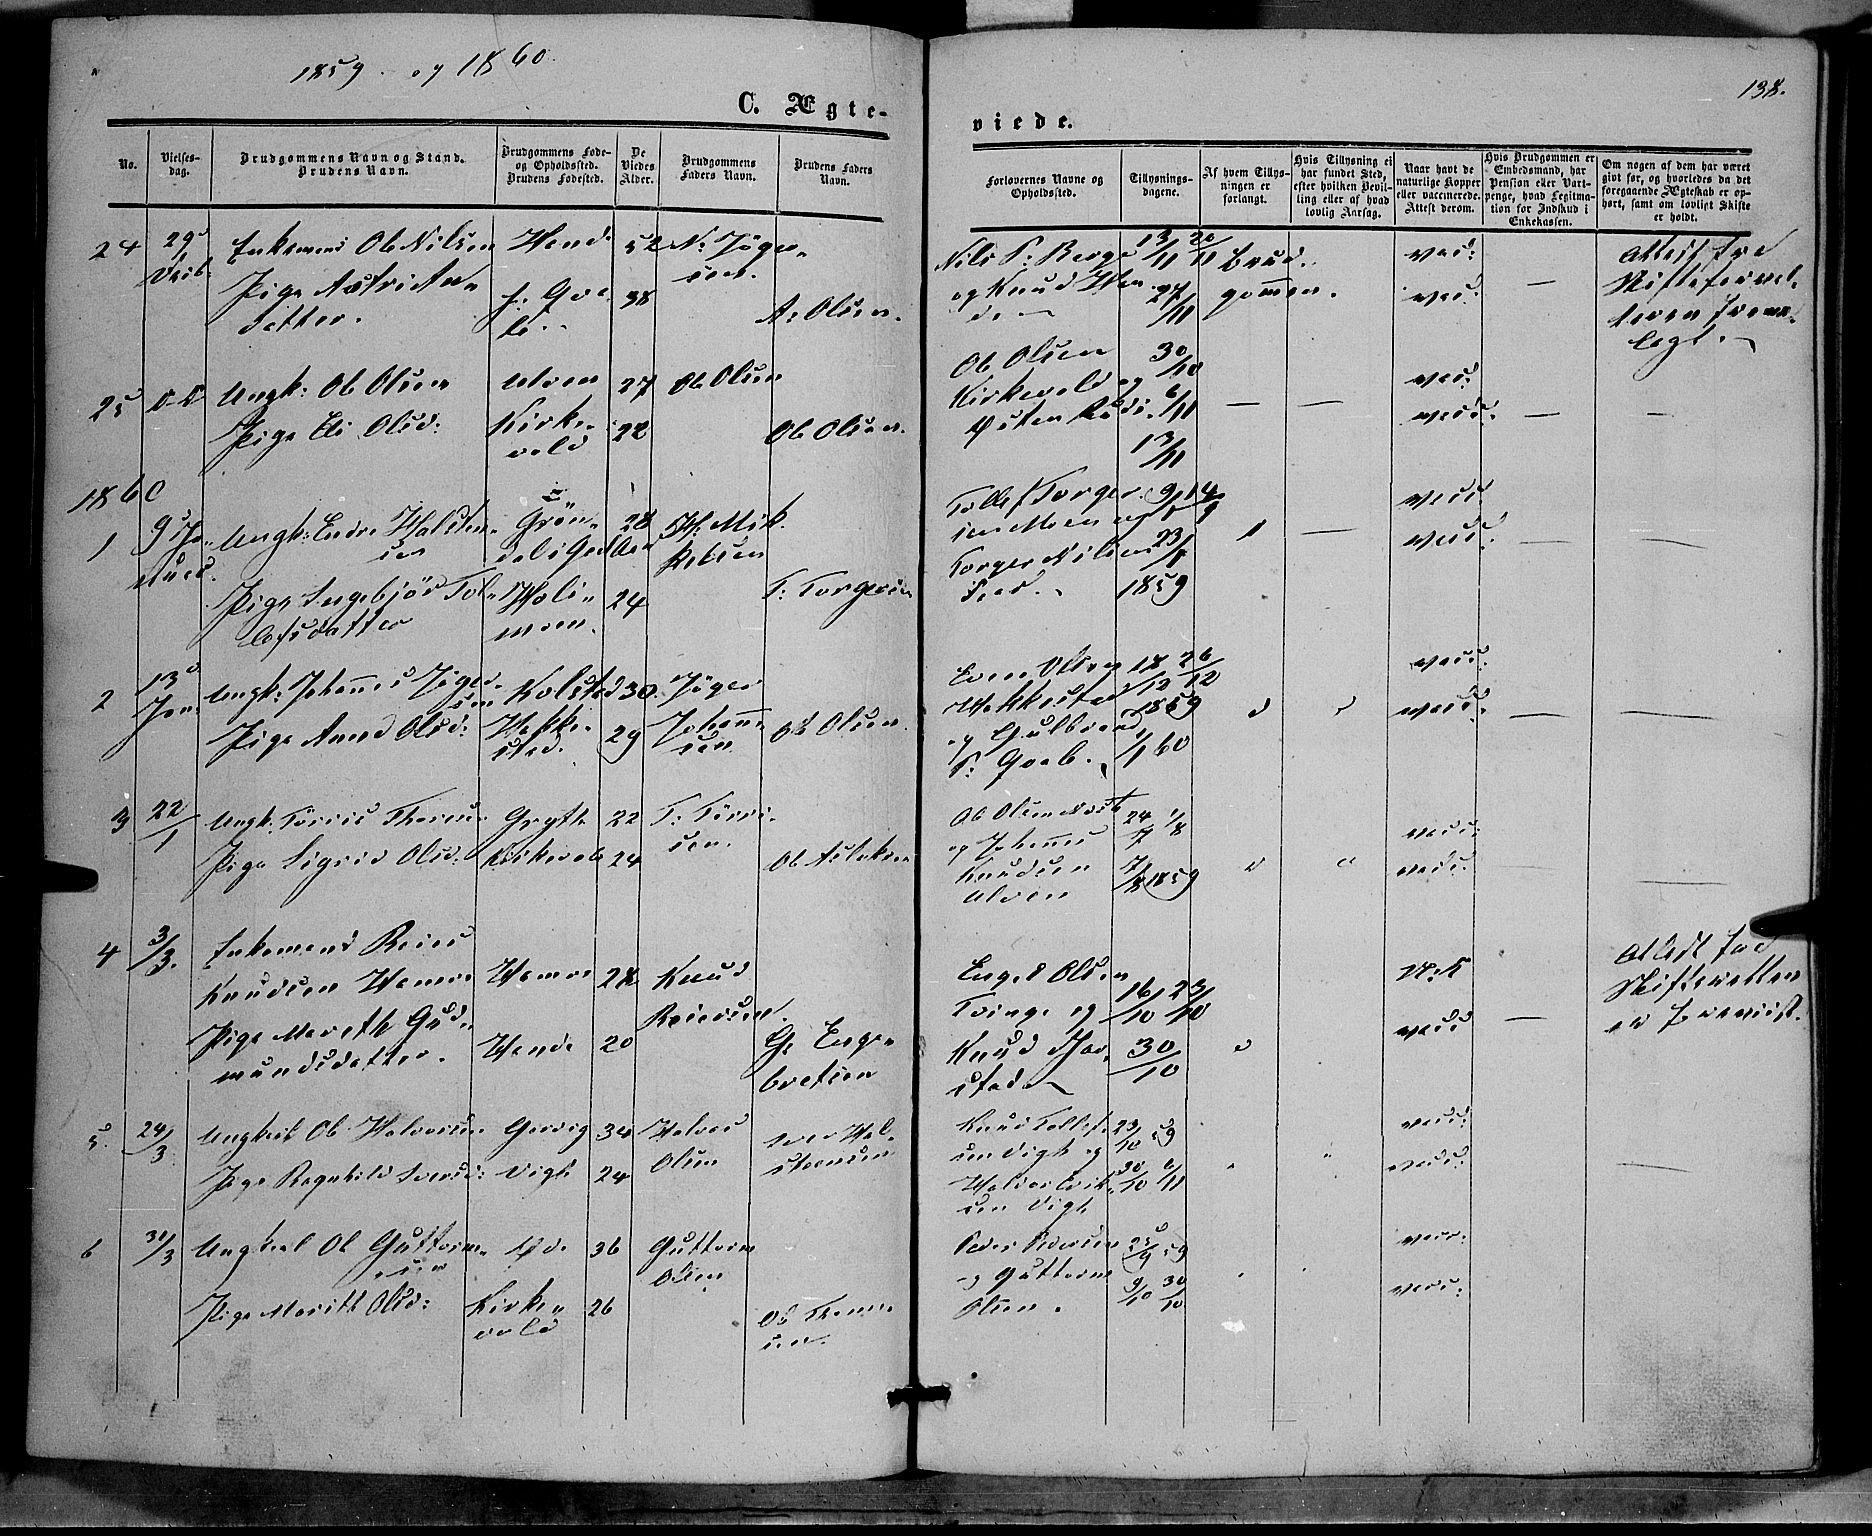 SAH, Vestre Slidre prestekontor, Ministerialbok nr. 2, 1856-1864, s. 138